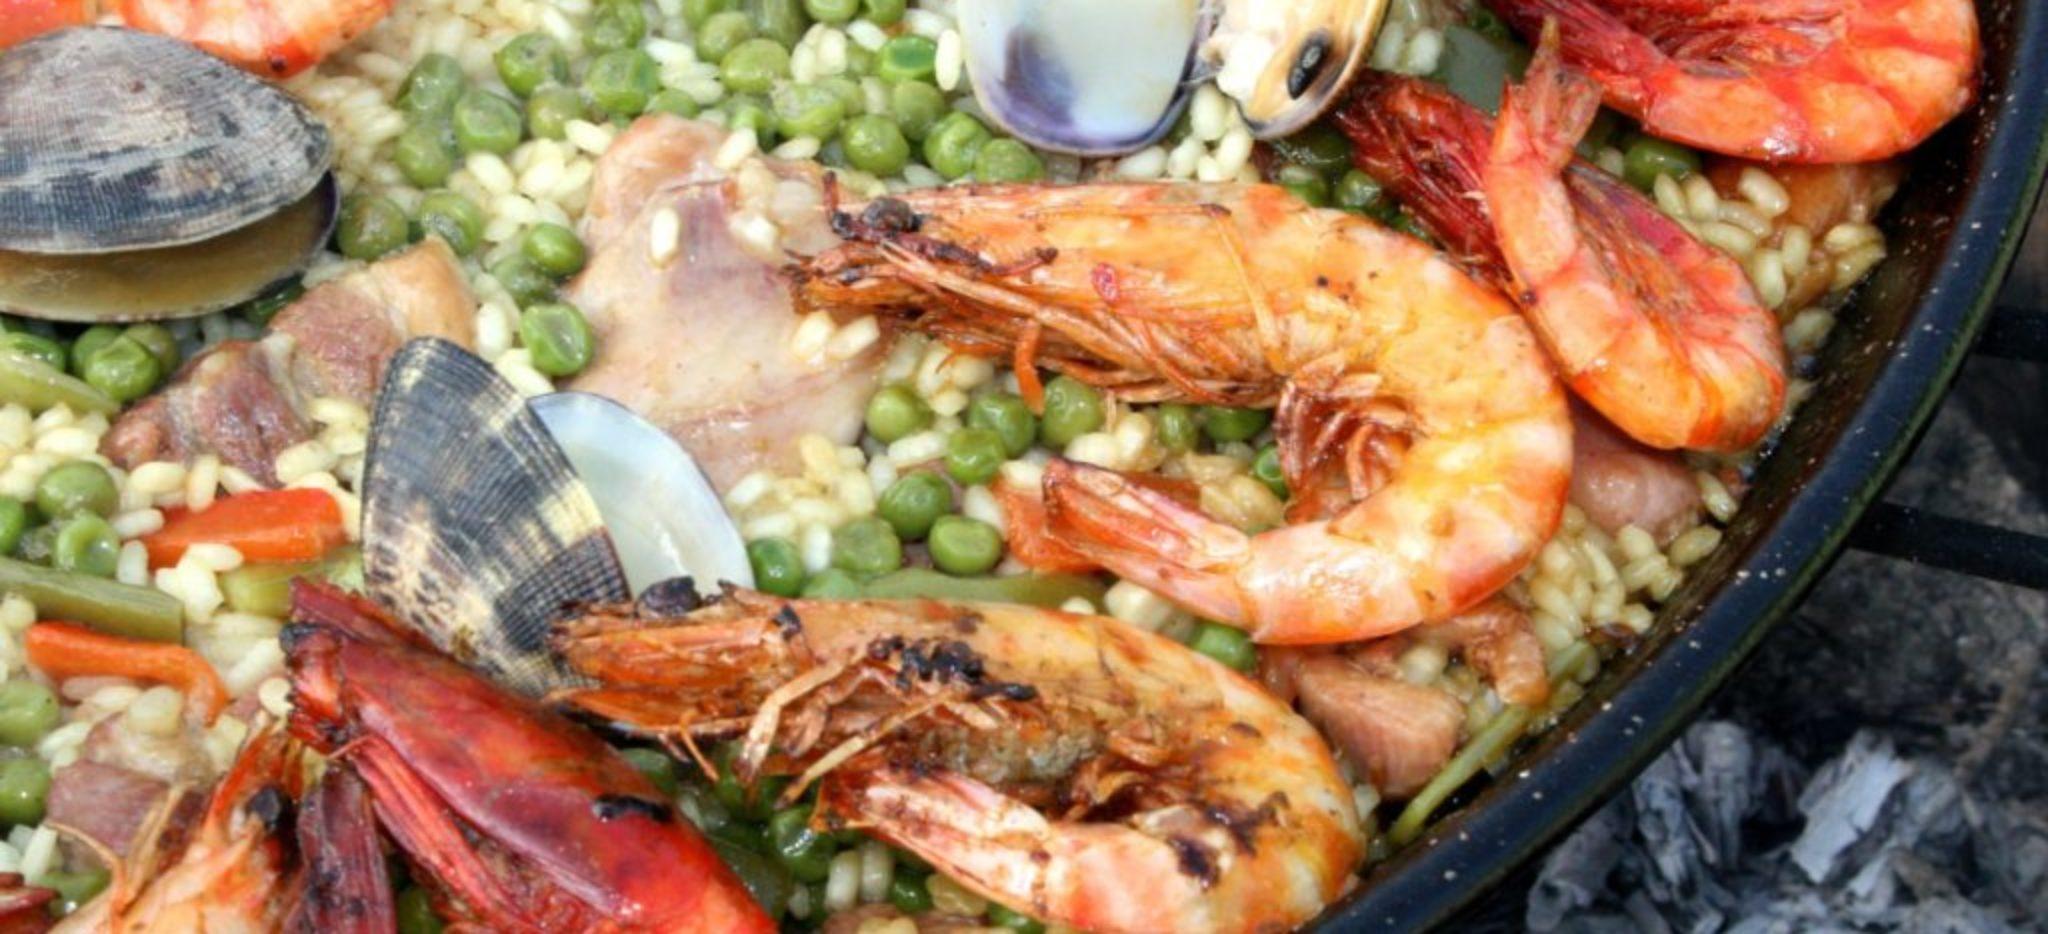 The Best Spanish Food